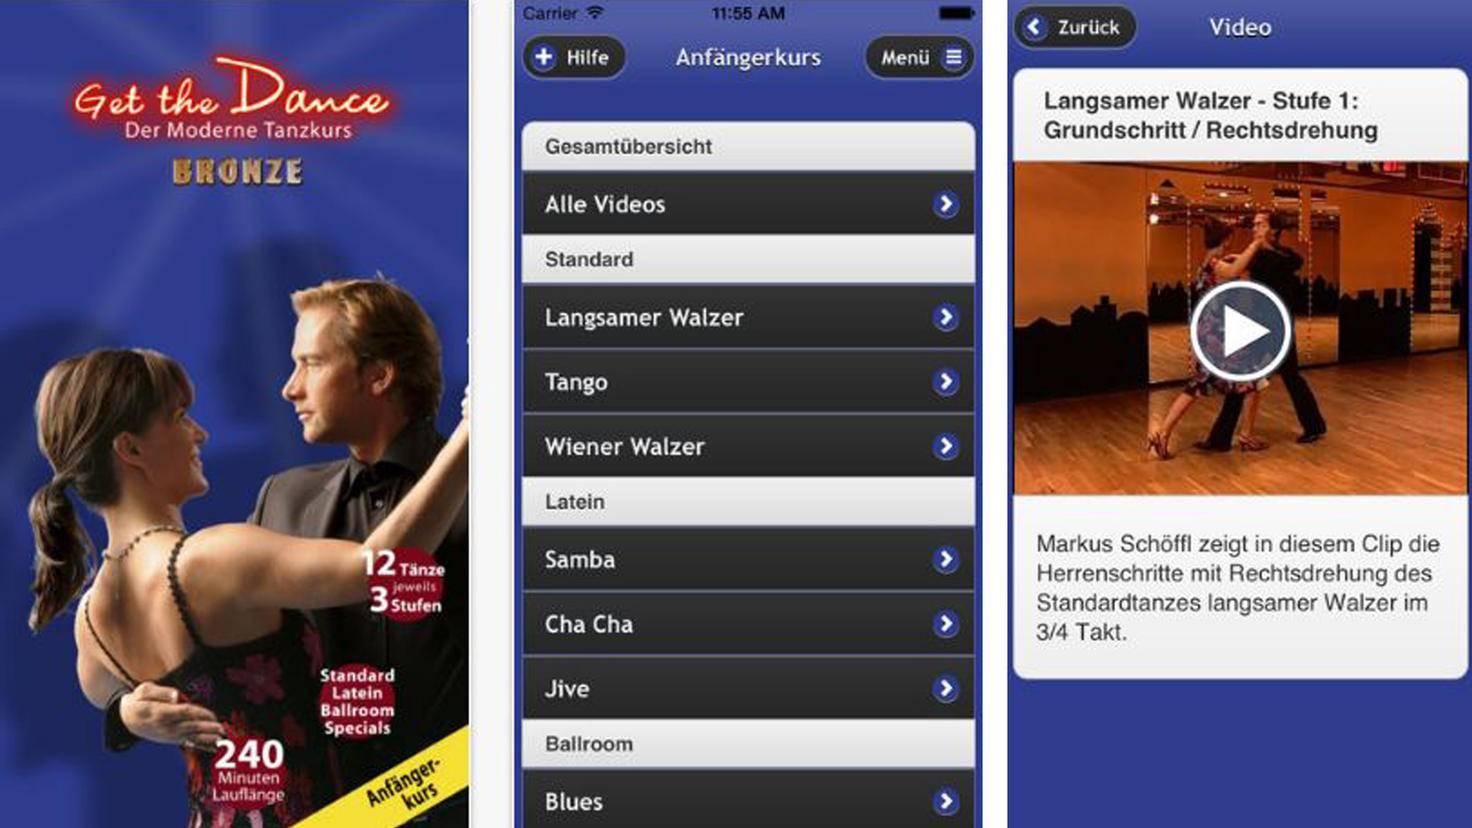 Get the Dance Bronze-iTunes-Yalster Online GmbH